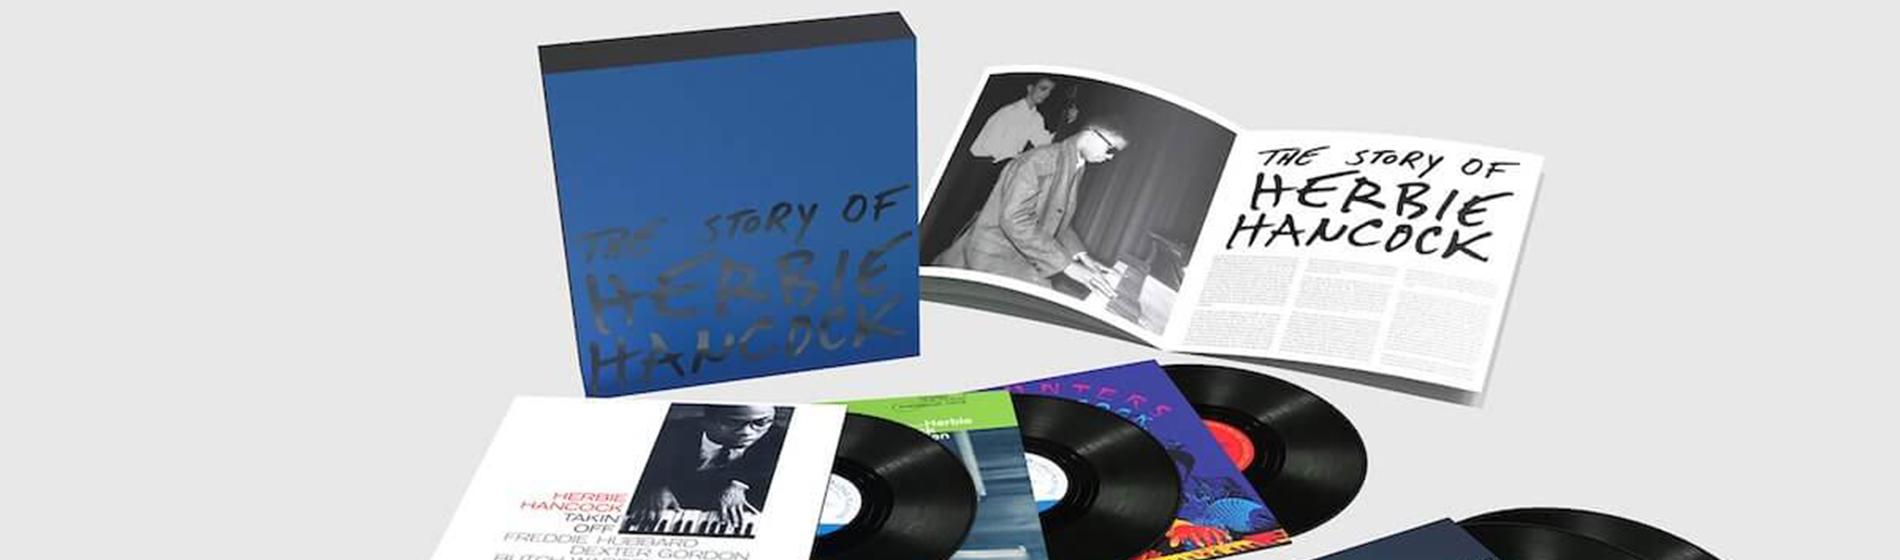 Vinyl Me Please Anthology The Story of Herbie Hancock